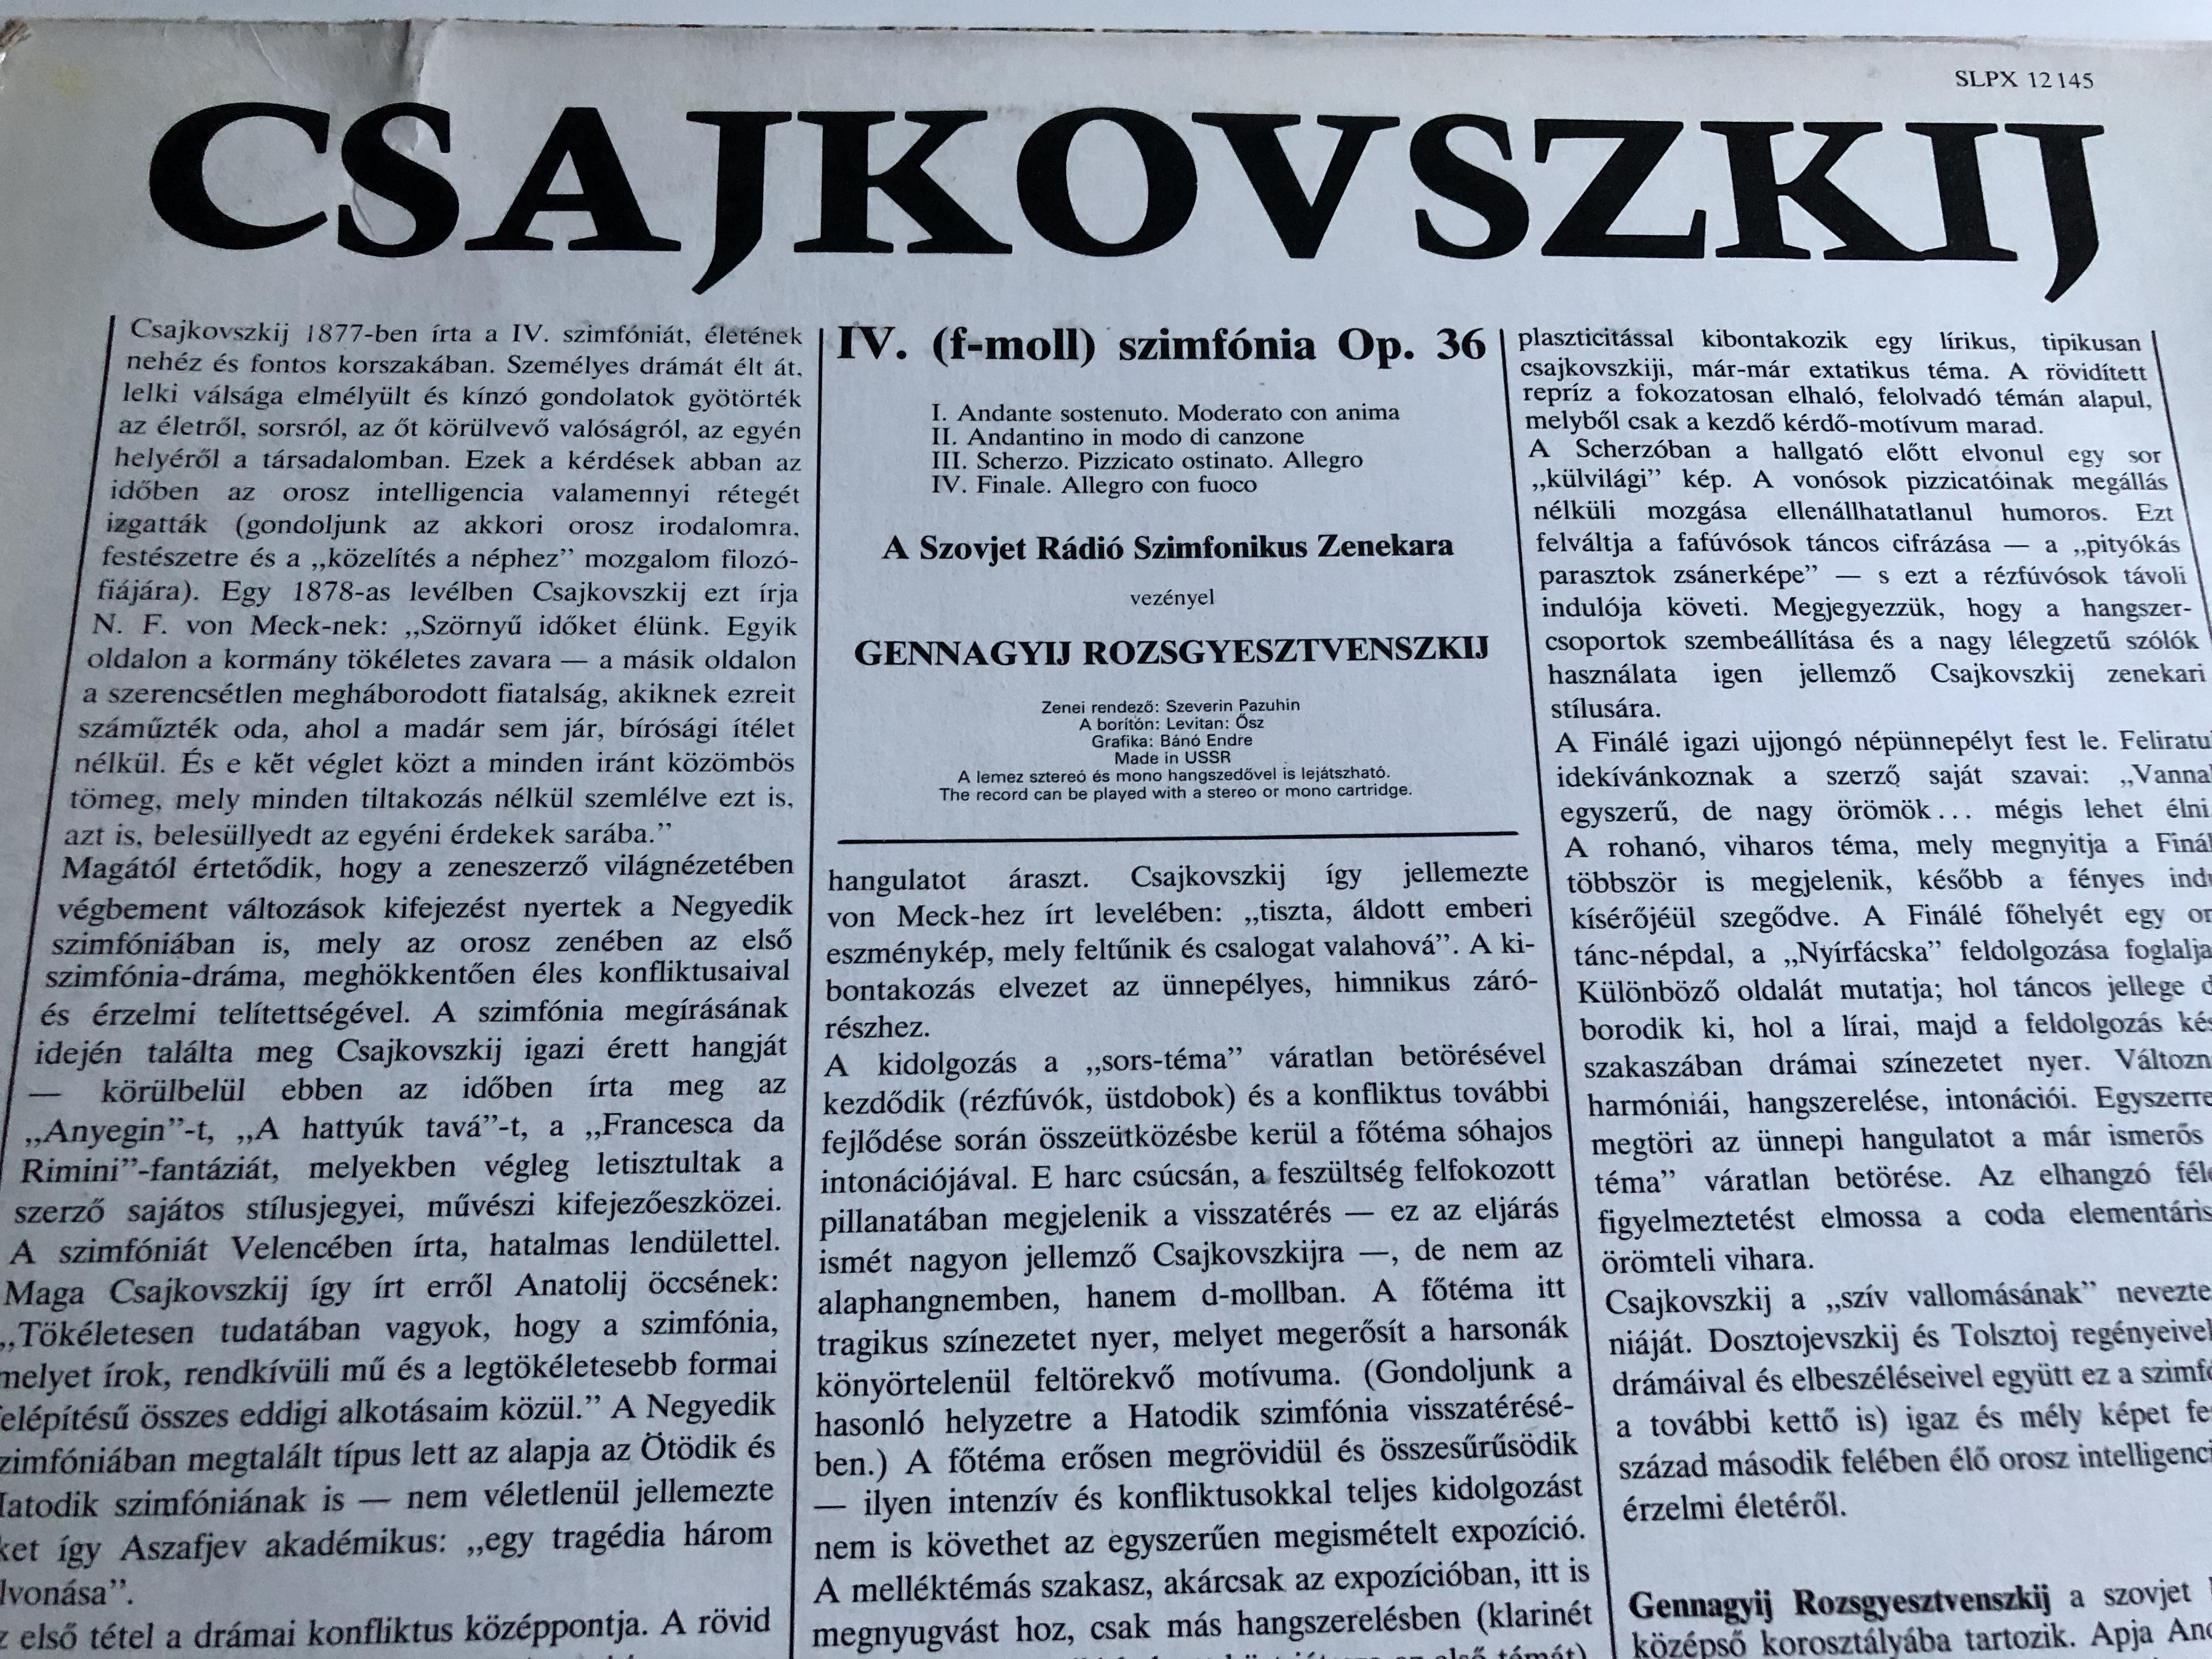 csajkovszkij-iv.-szimf-nia-op.-36-a-szovjet-r-di-szimfonikus-zenekara-gennagyij-rozsgyesztvenszkij-hungaroton-lp-stereo-slpx-12145-4-.jpg